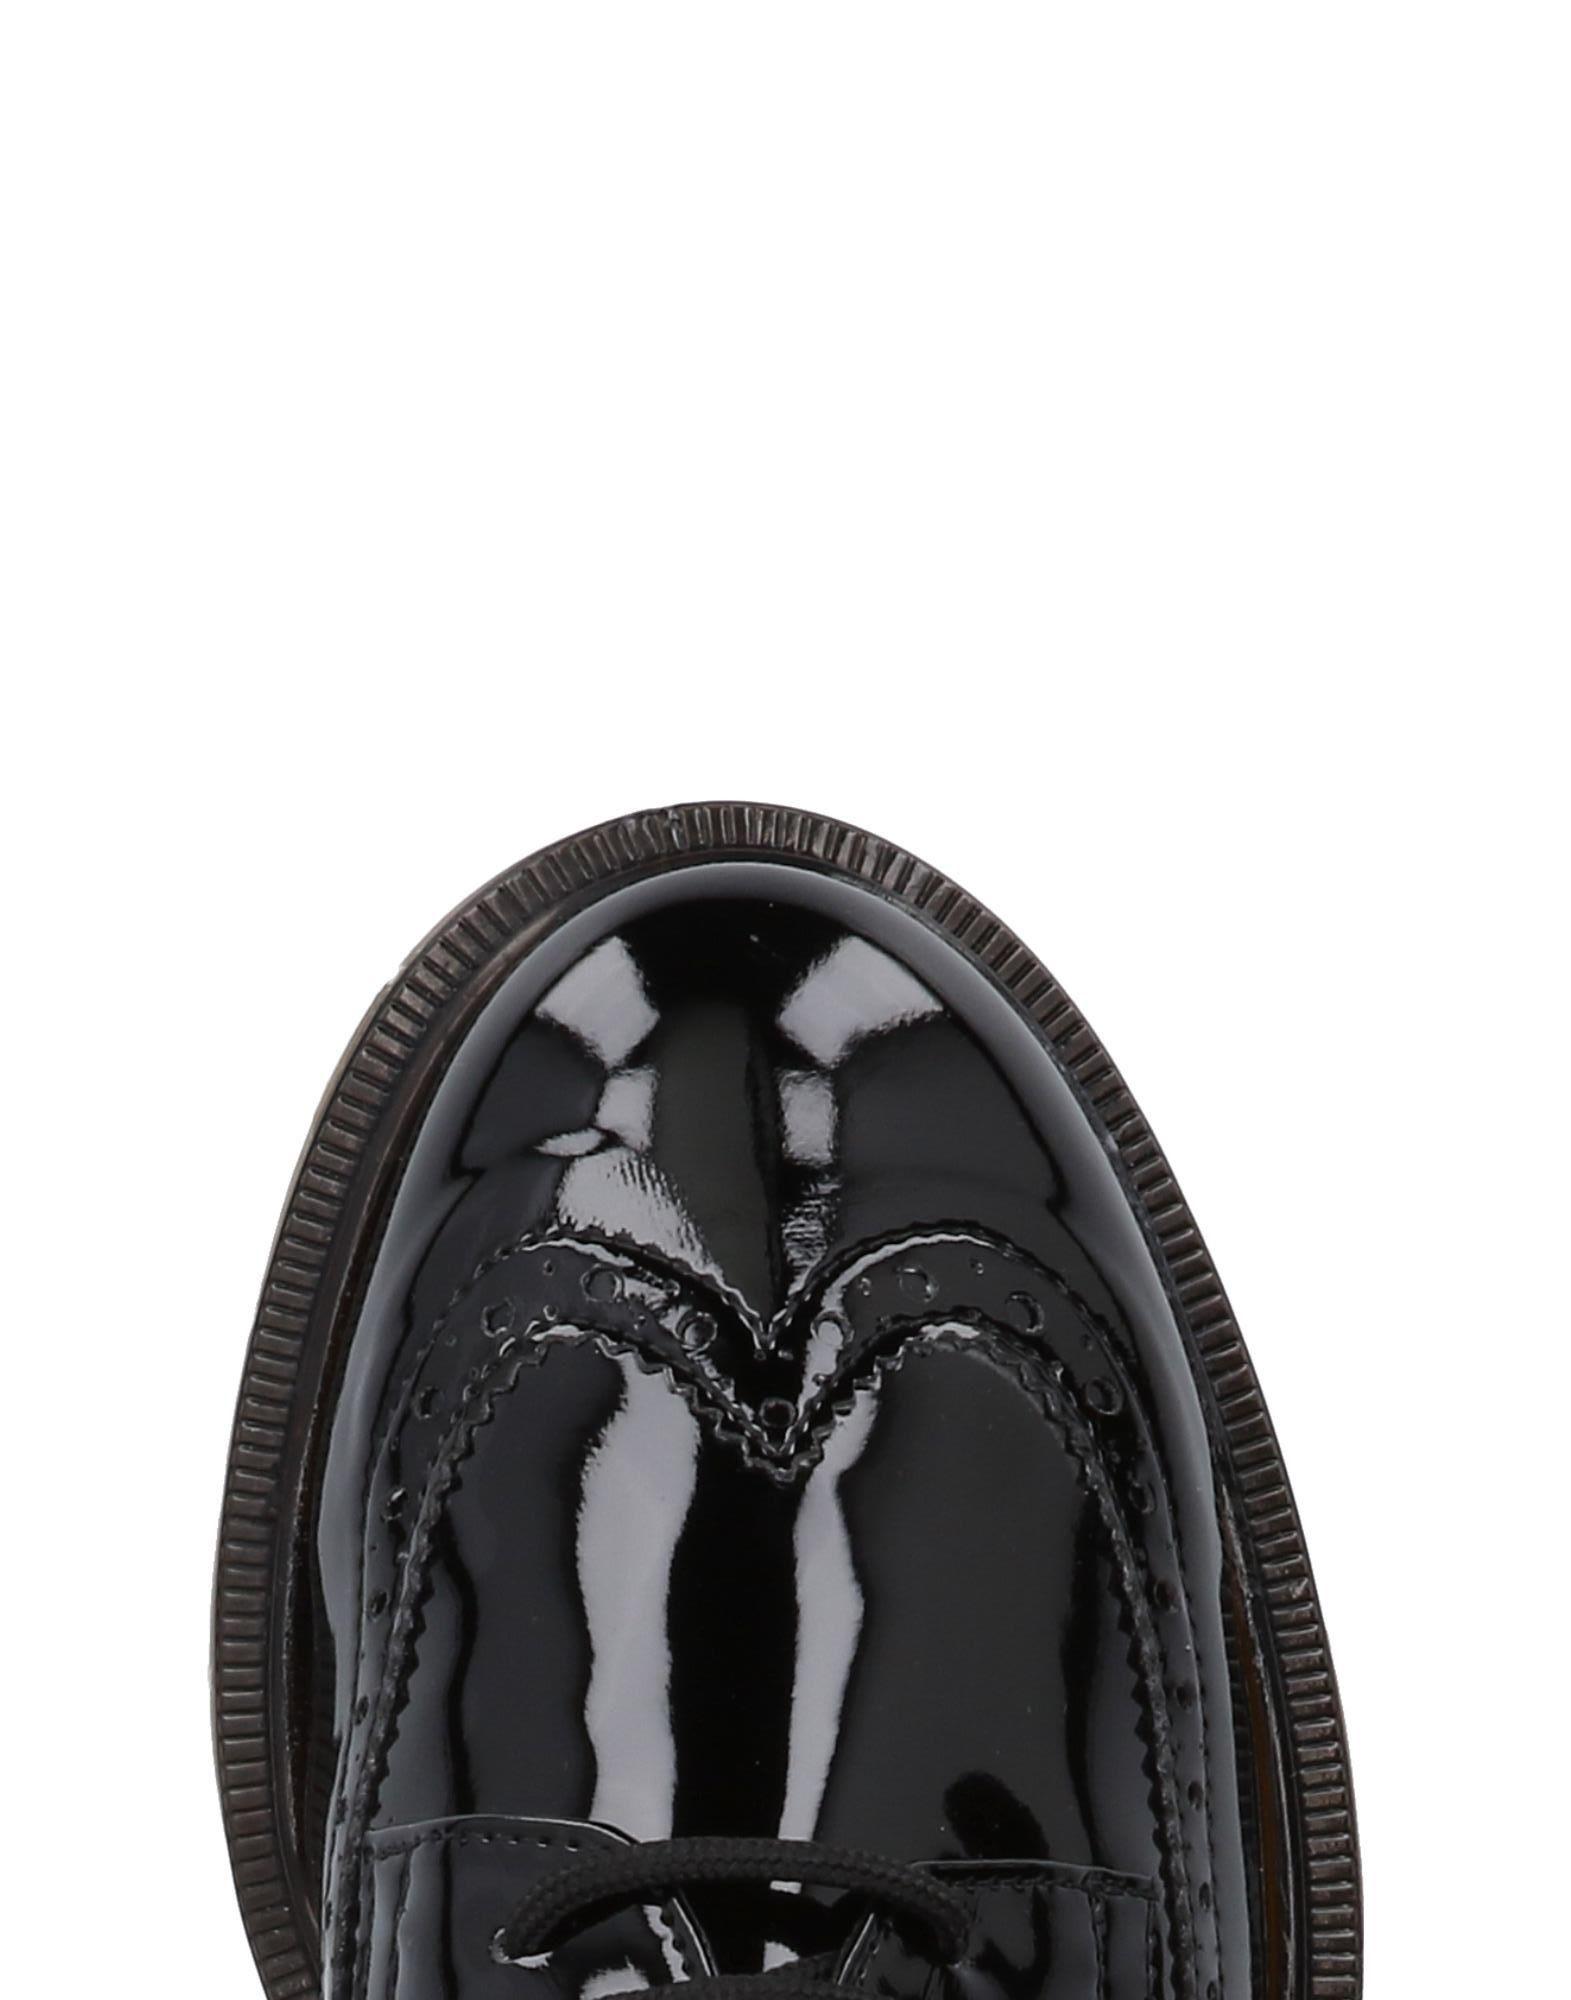 Tsd12 Schnürschuhe Damen Damen Schnürschuhe  11453941HM Gute Qualität beliebte Schuhe 228cdb